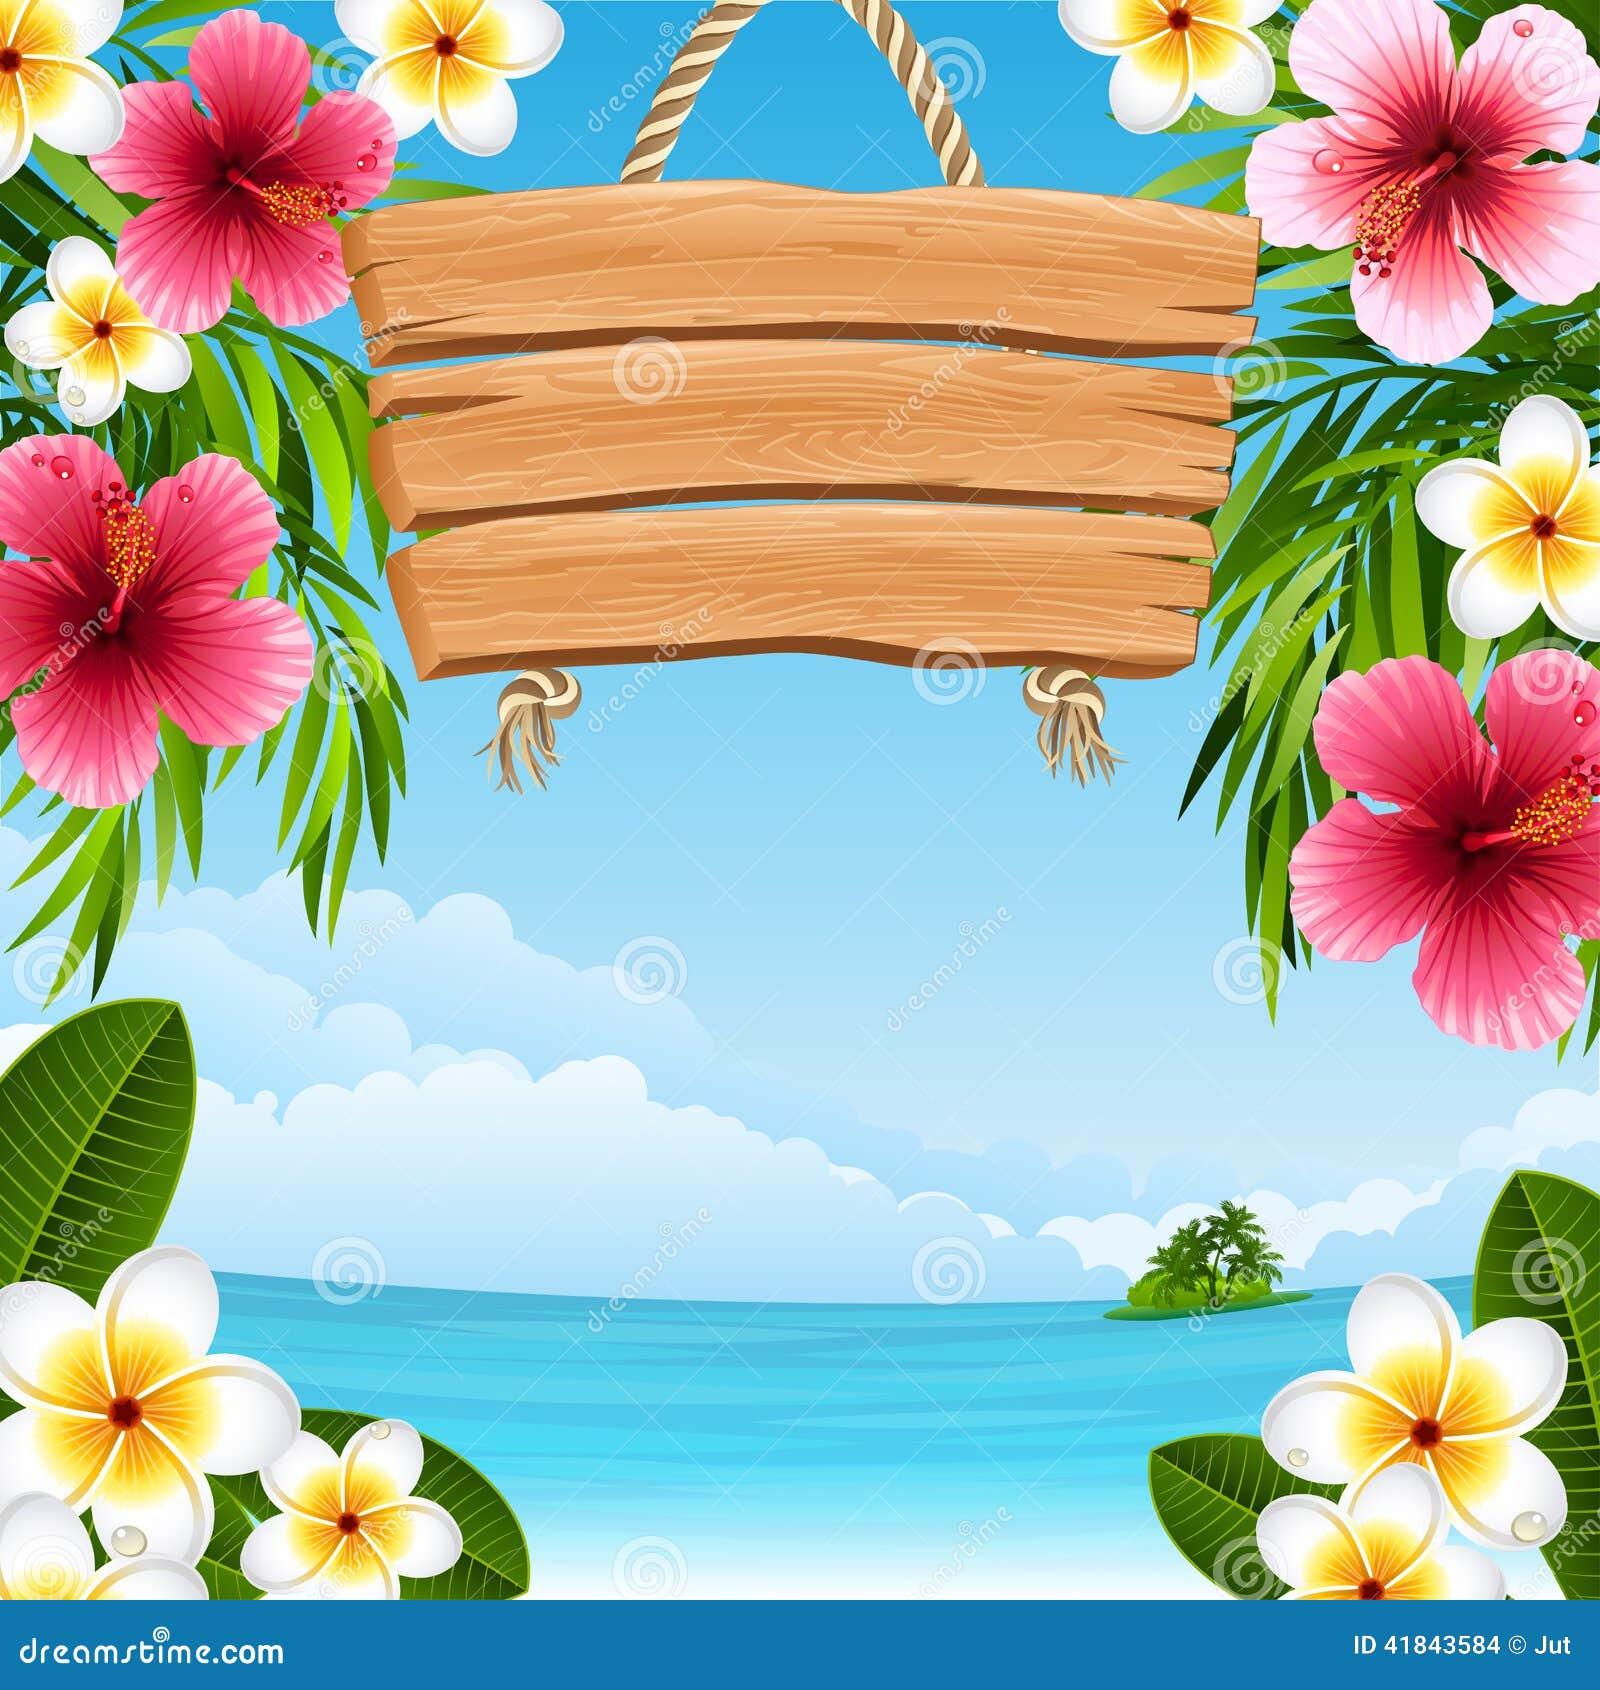 vector scenery tropical - photo #40